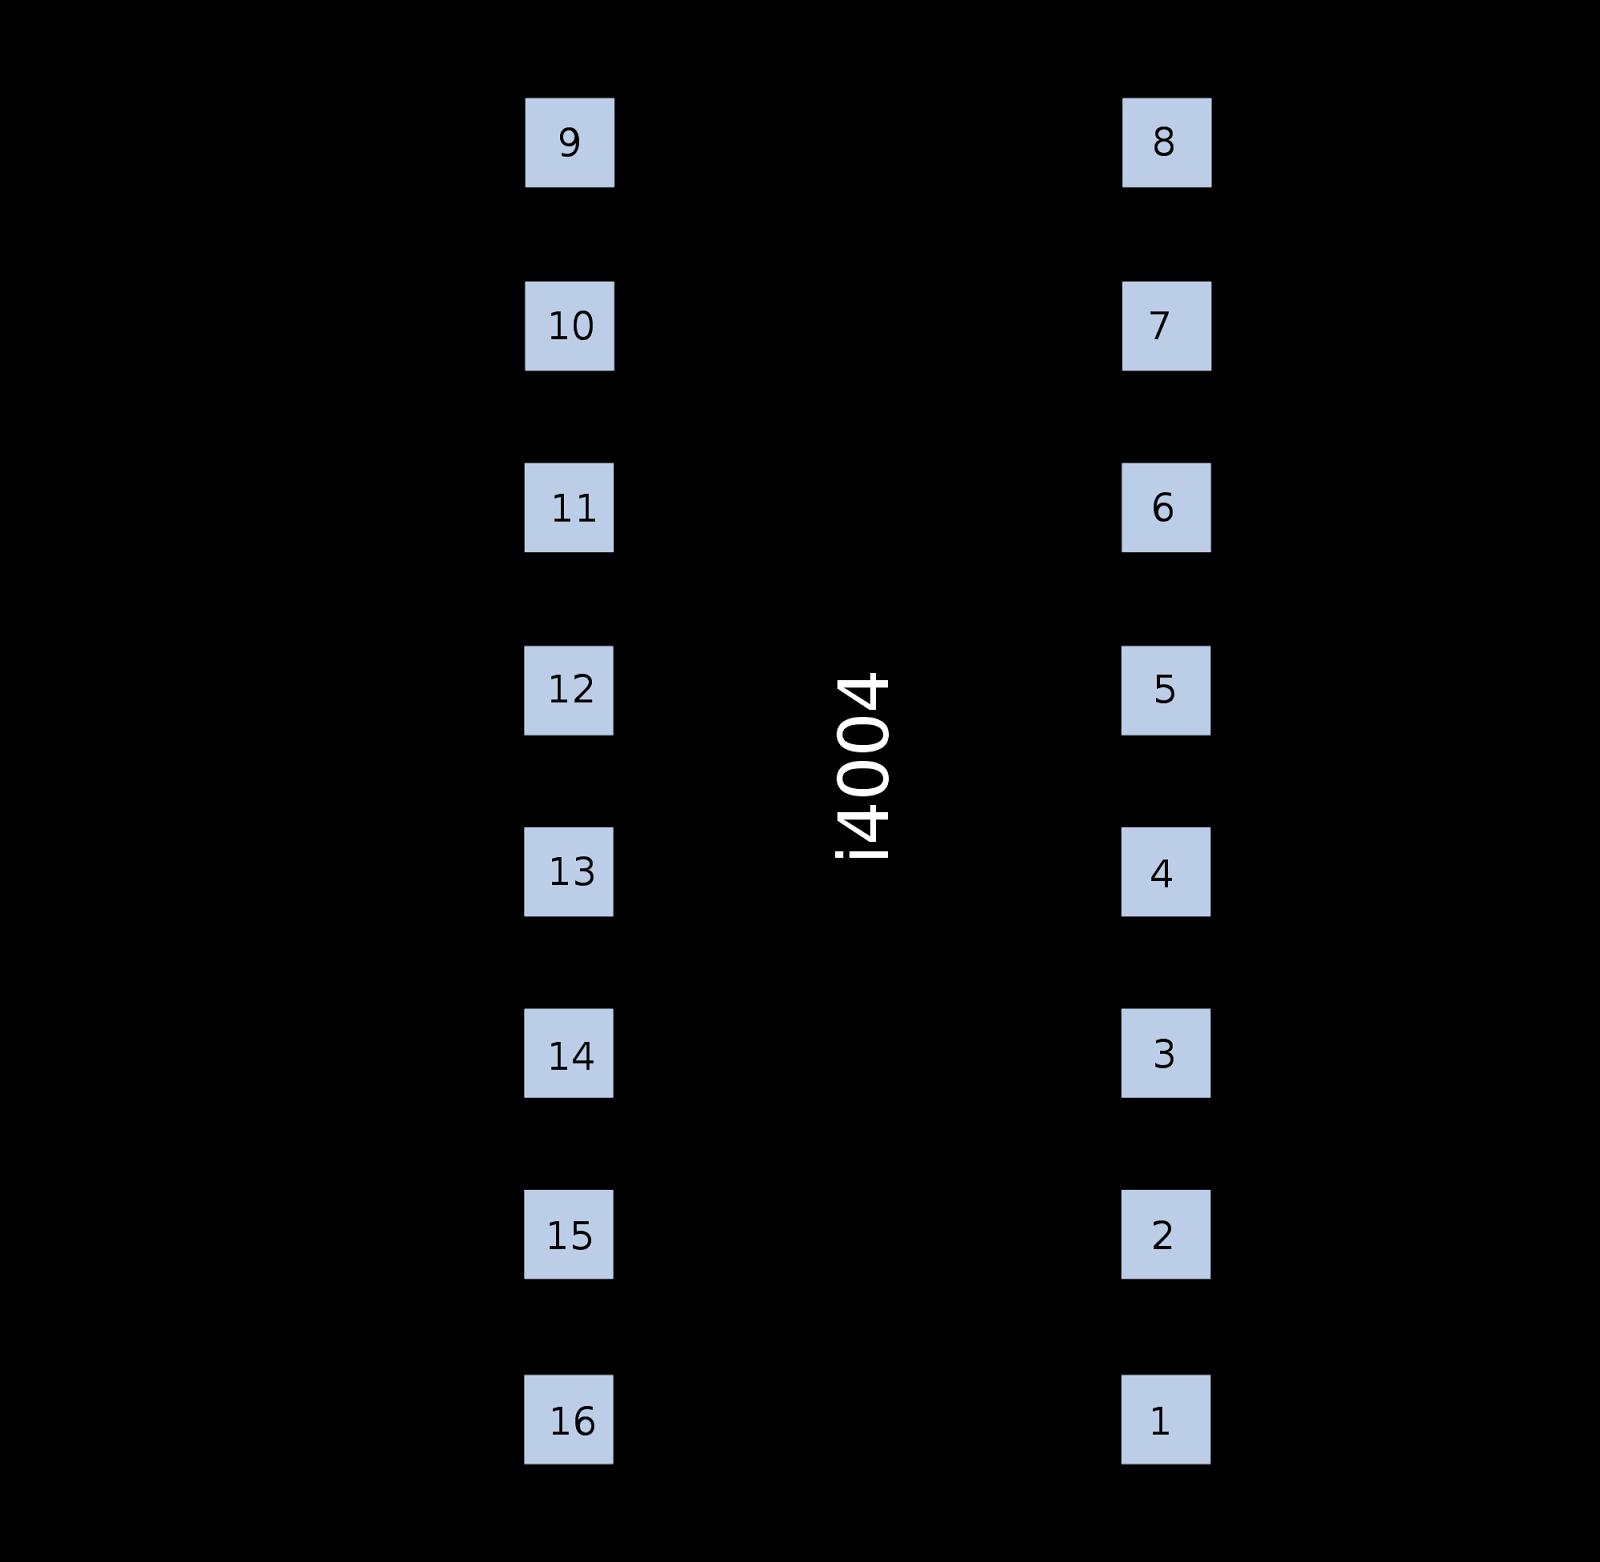 Basic Microprocessors Intel 4004 And 8085 Sadaf Media Block Diagram Microprocessor The